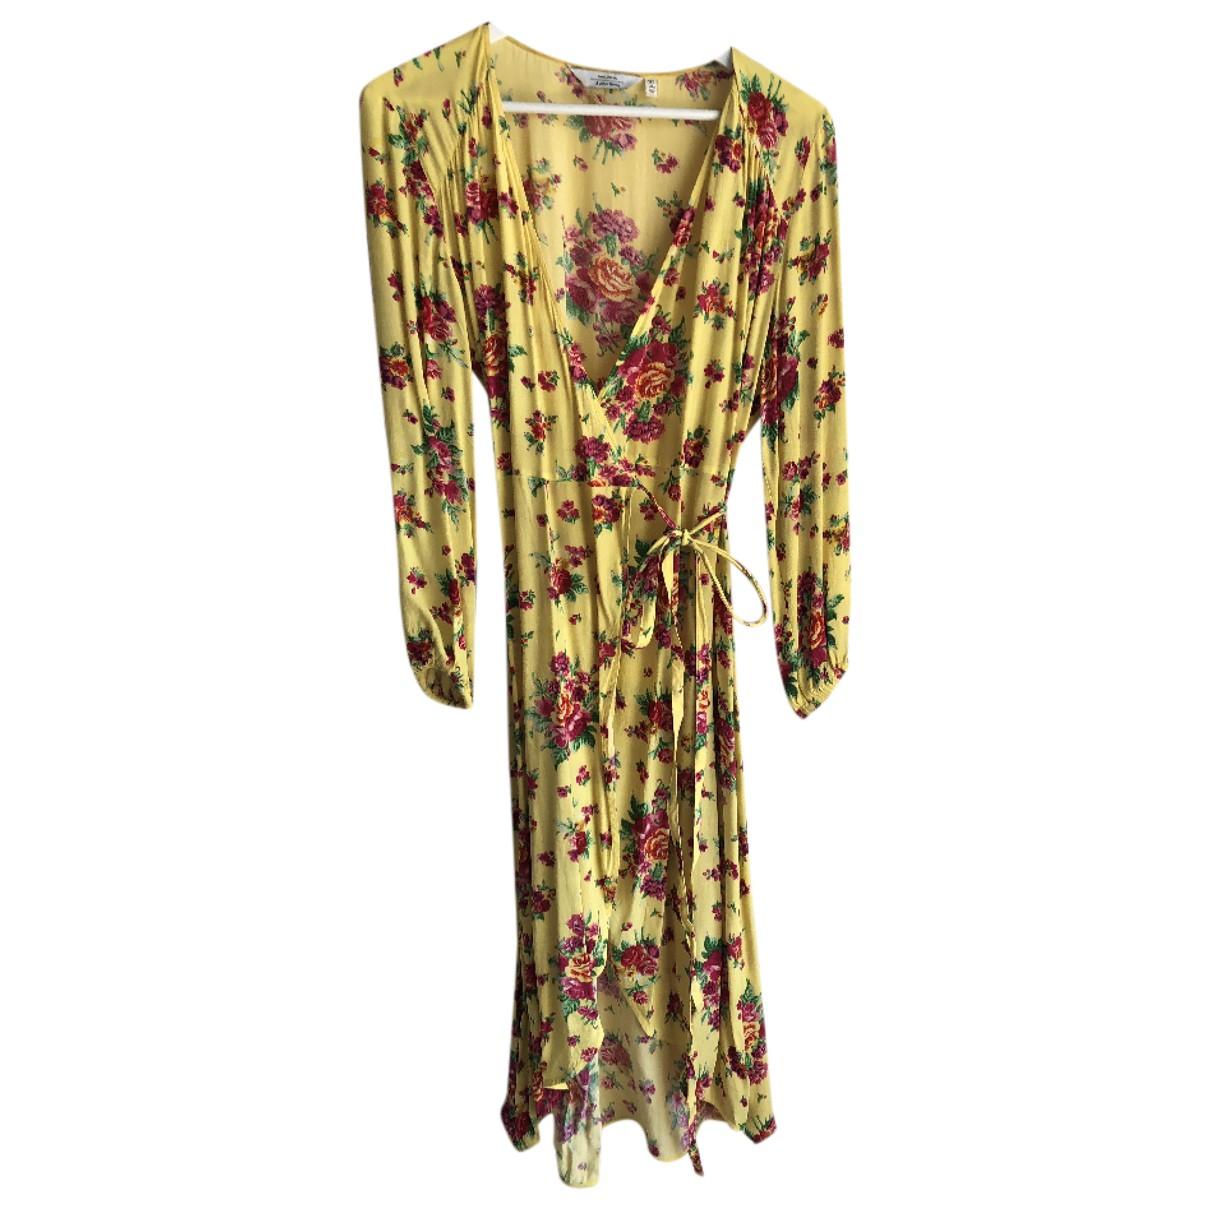 & Stories \N Yellow dress for Women 34 FR